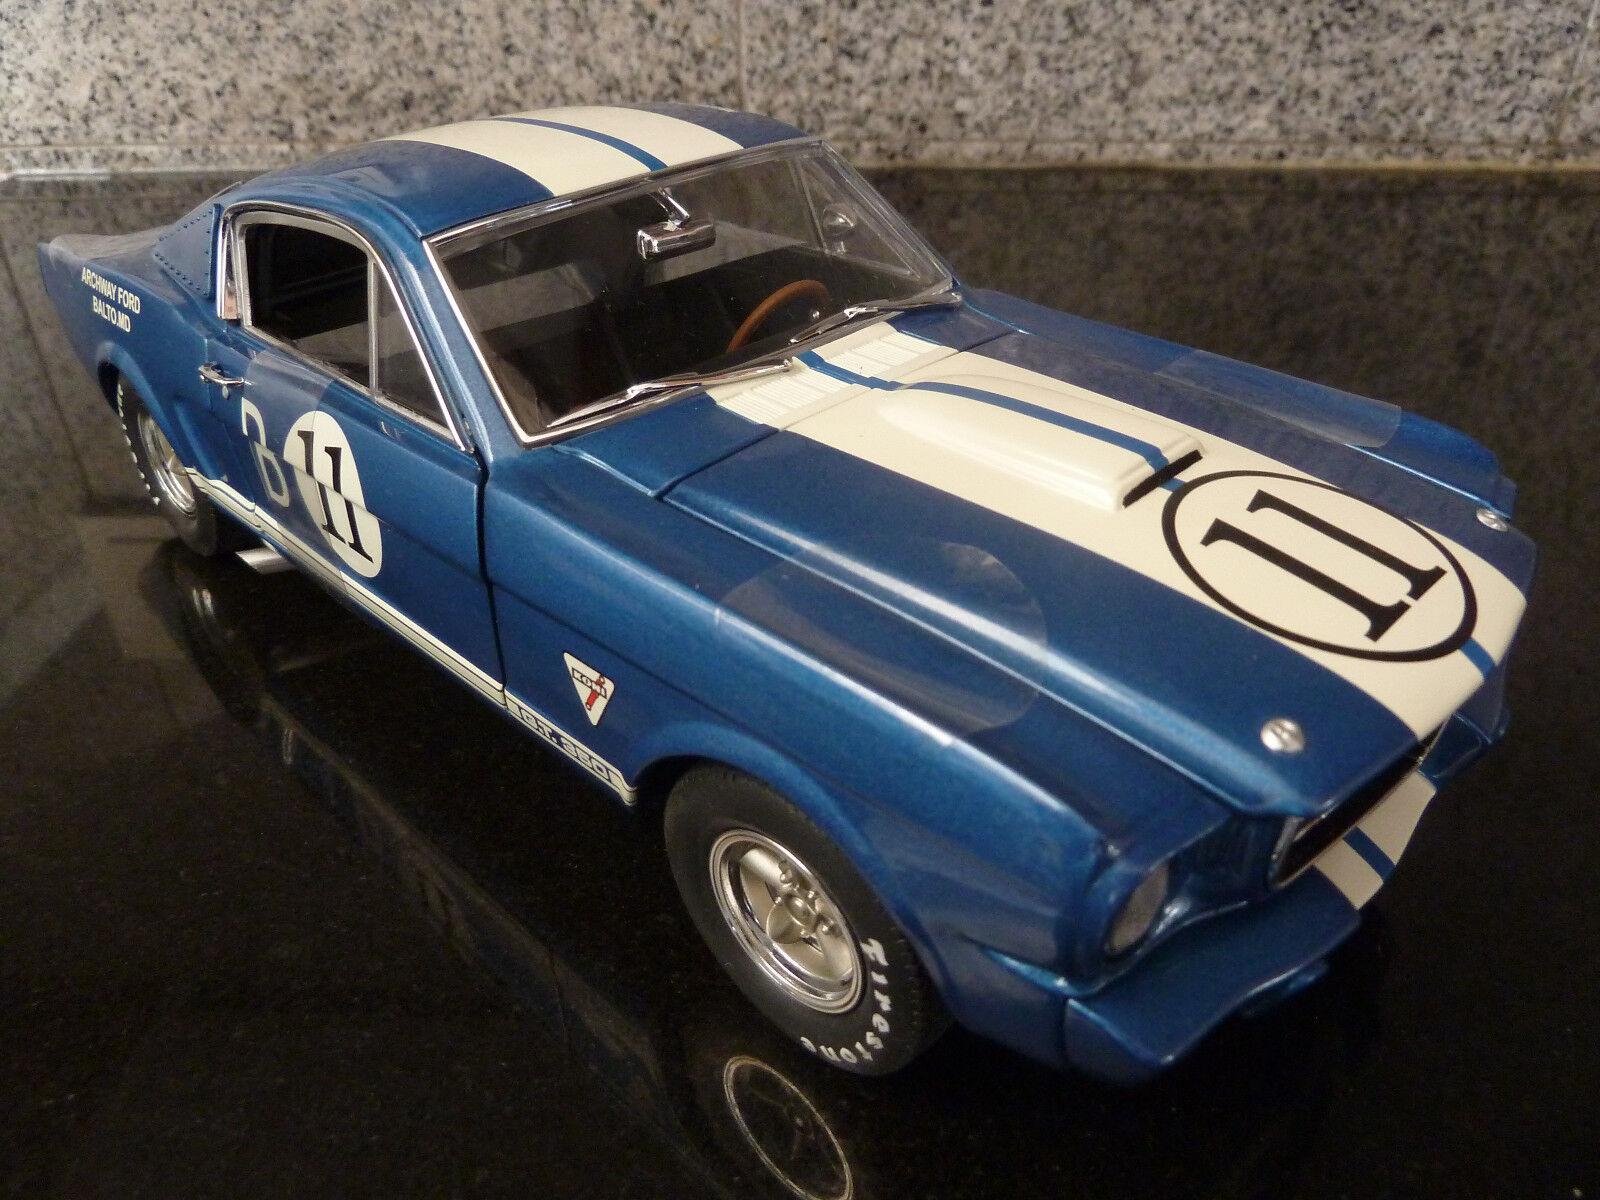 edición limitada 1 18 18 18 GMP, Shelby Mustang GT 350r, Mark Donohue,  11  muchas concesiones